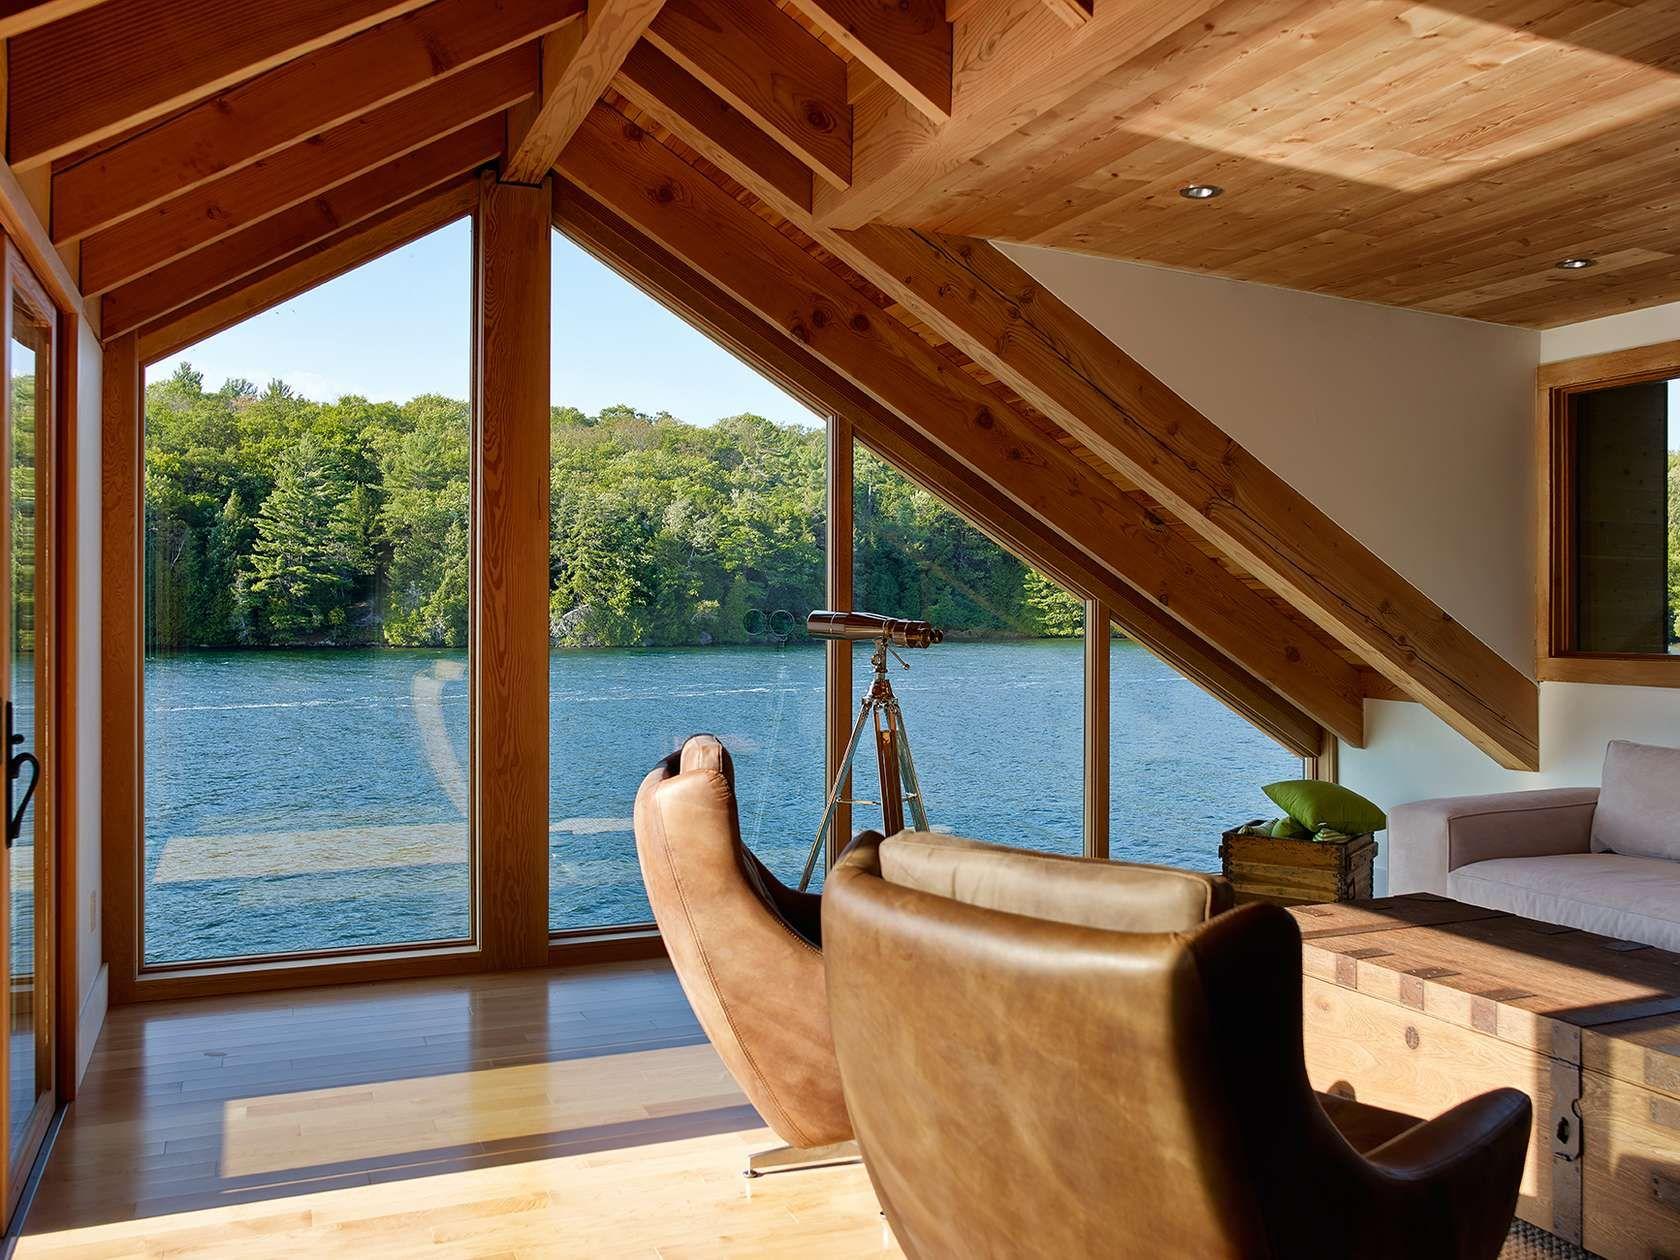 Lake joseph boathouse architecture pinterest architecture